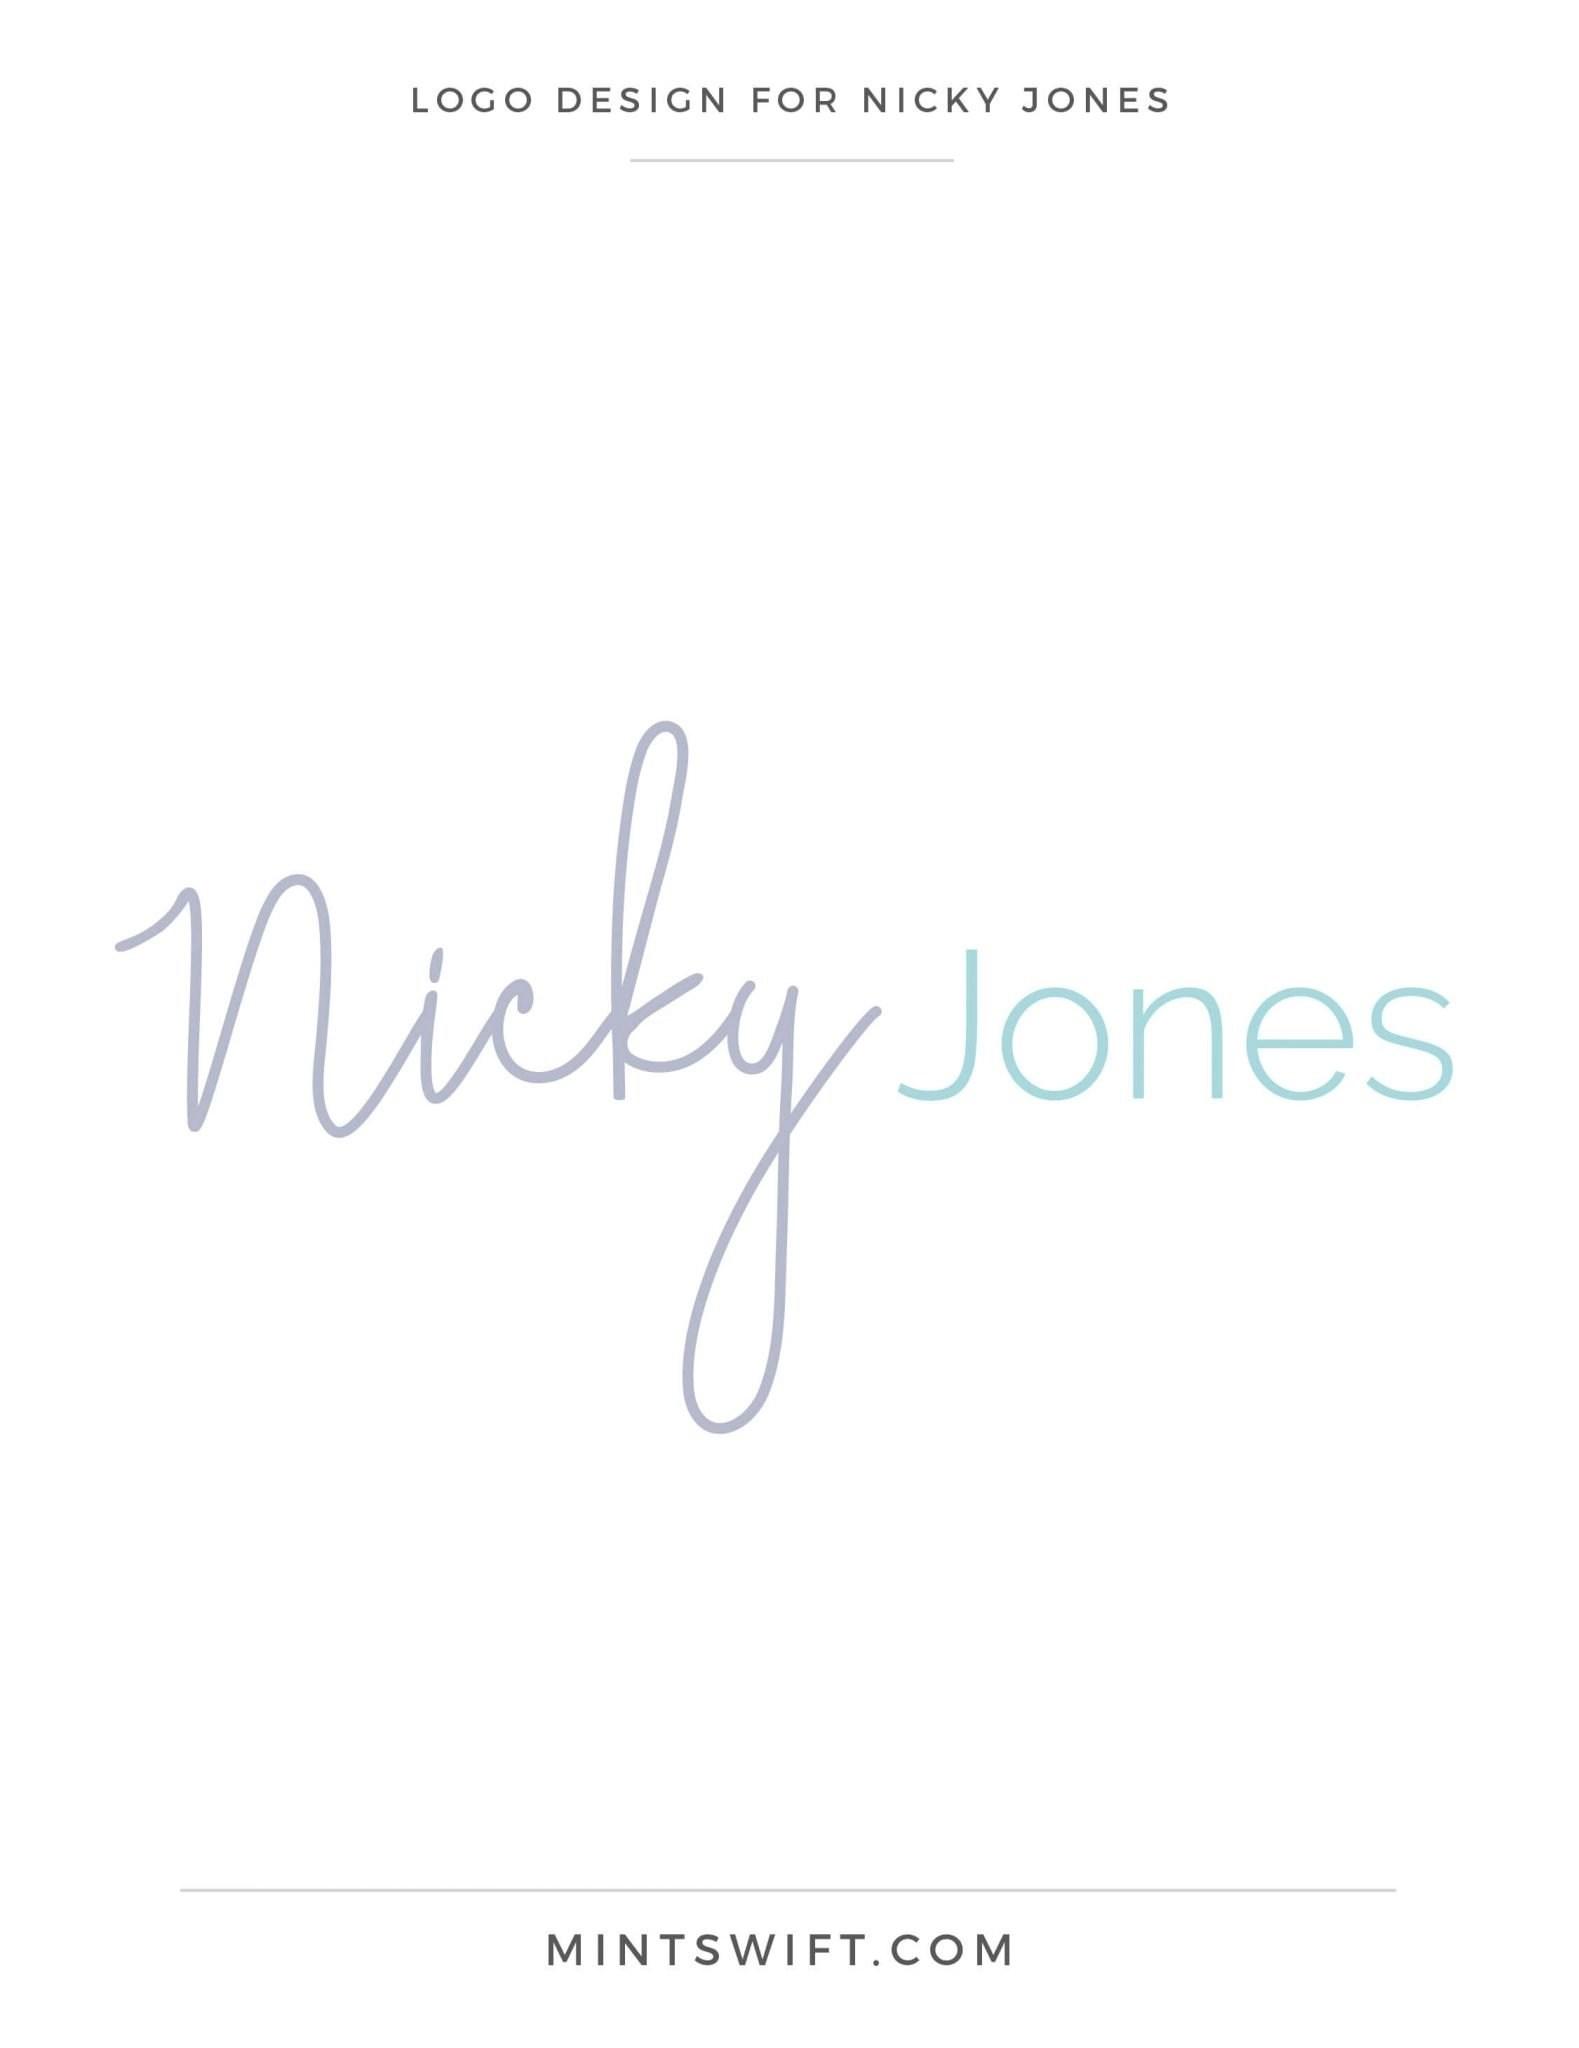 Nicky Jones - Logo Design - Brand Design Package - MintSwift